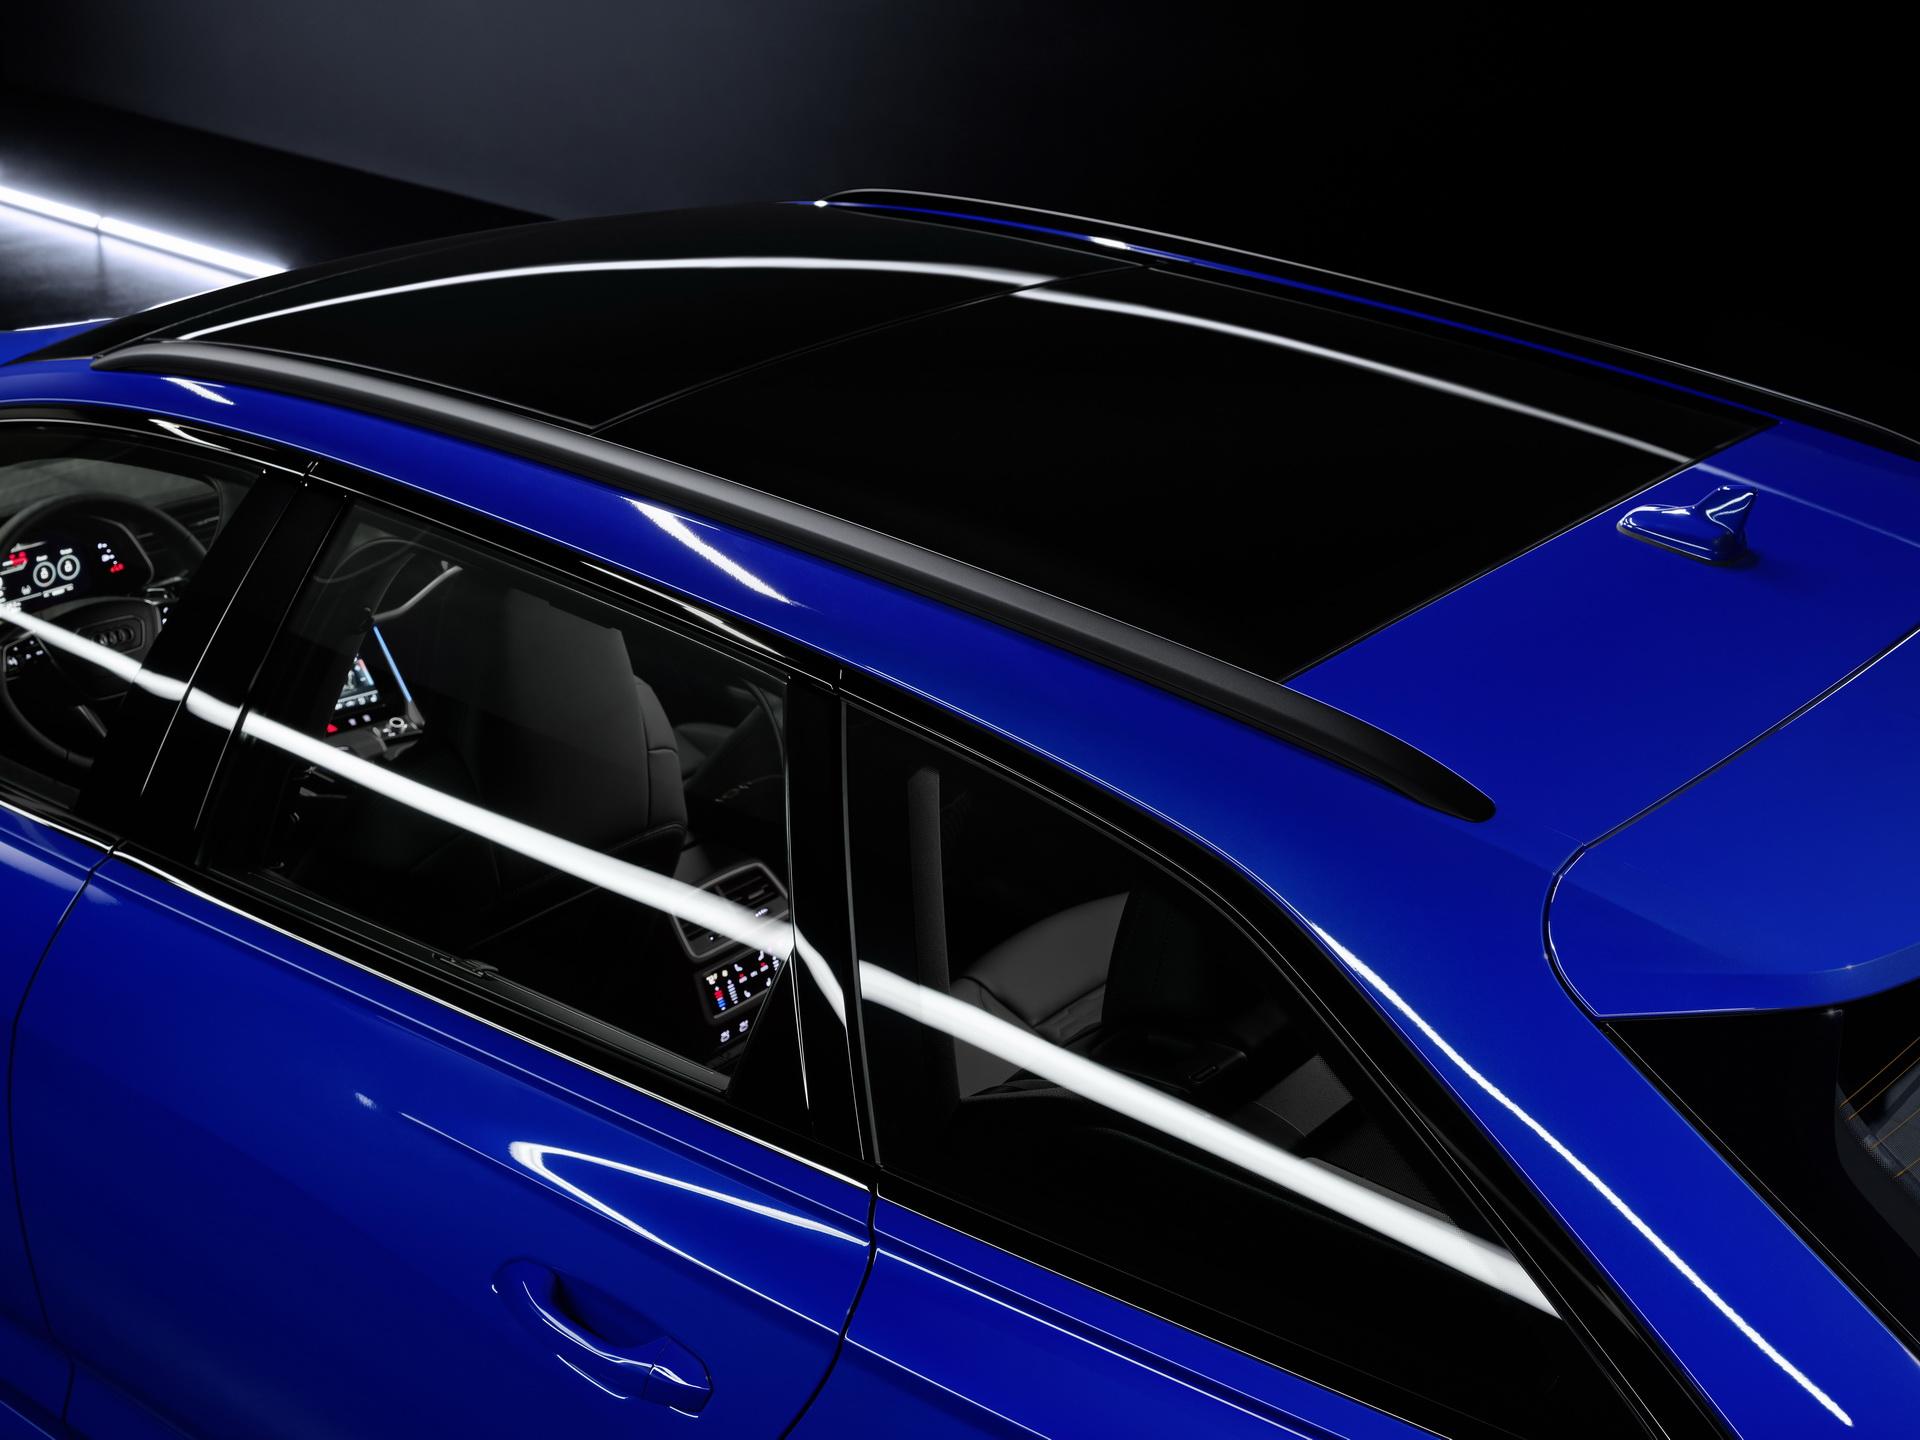 2021-Audi-RS6-Tribute-Edition-08.jpg